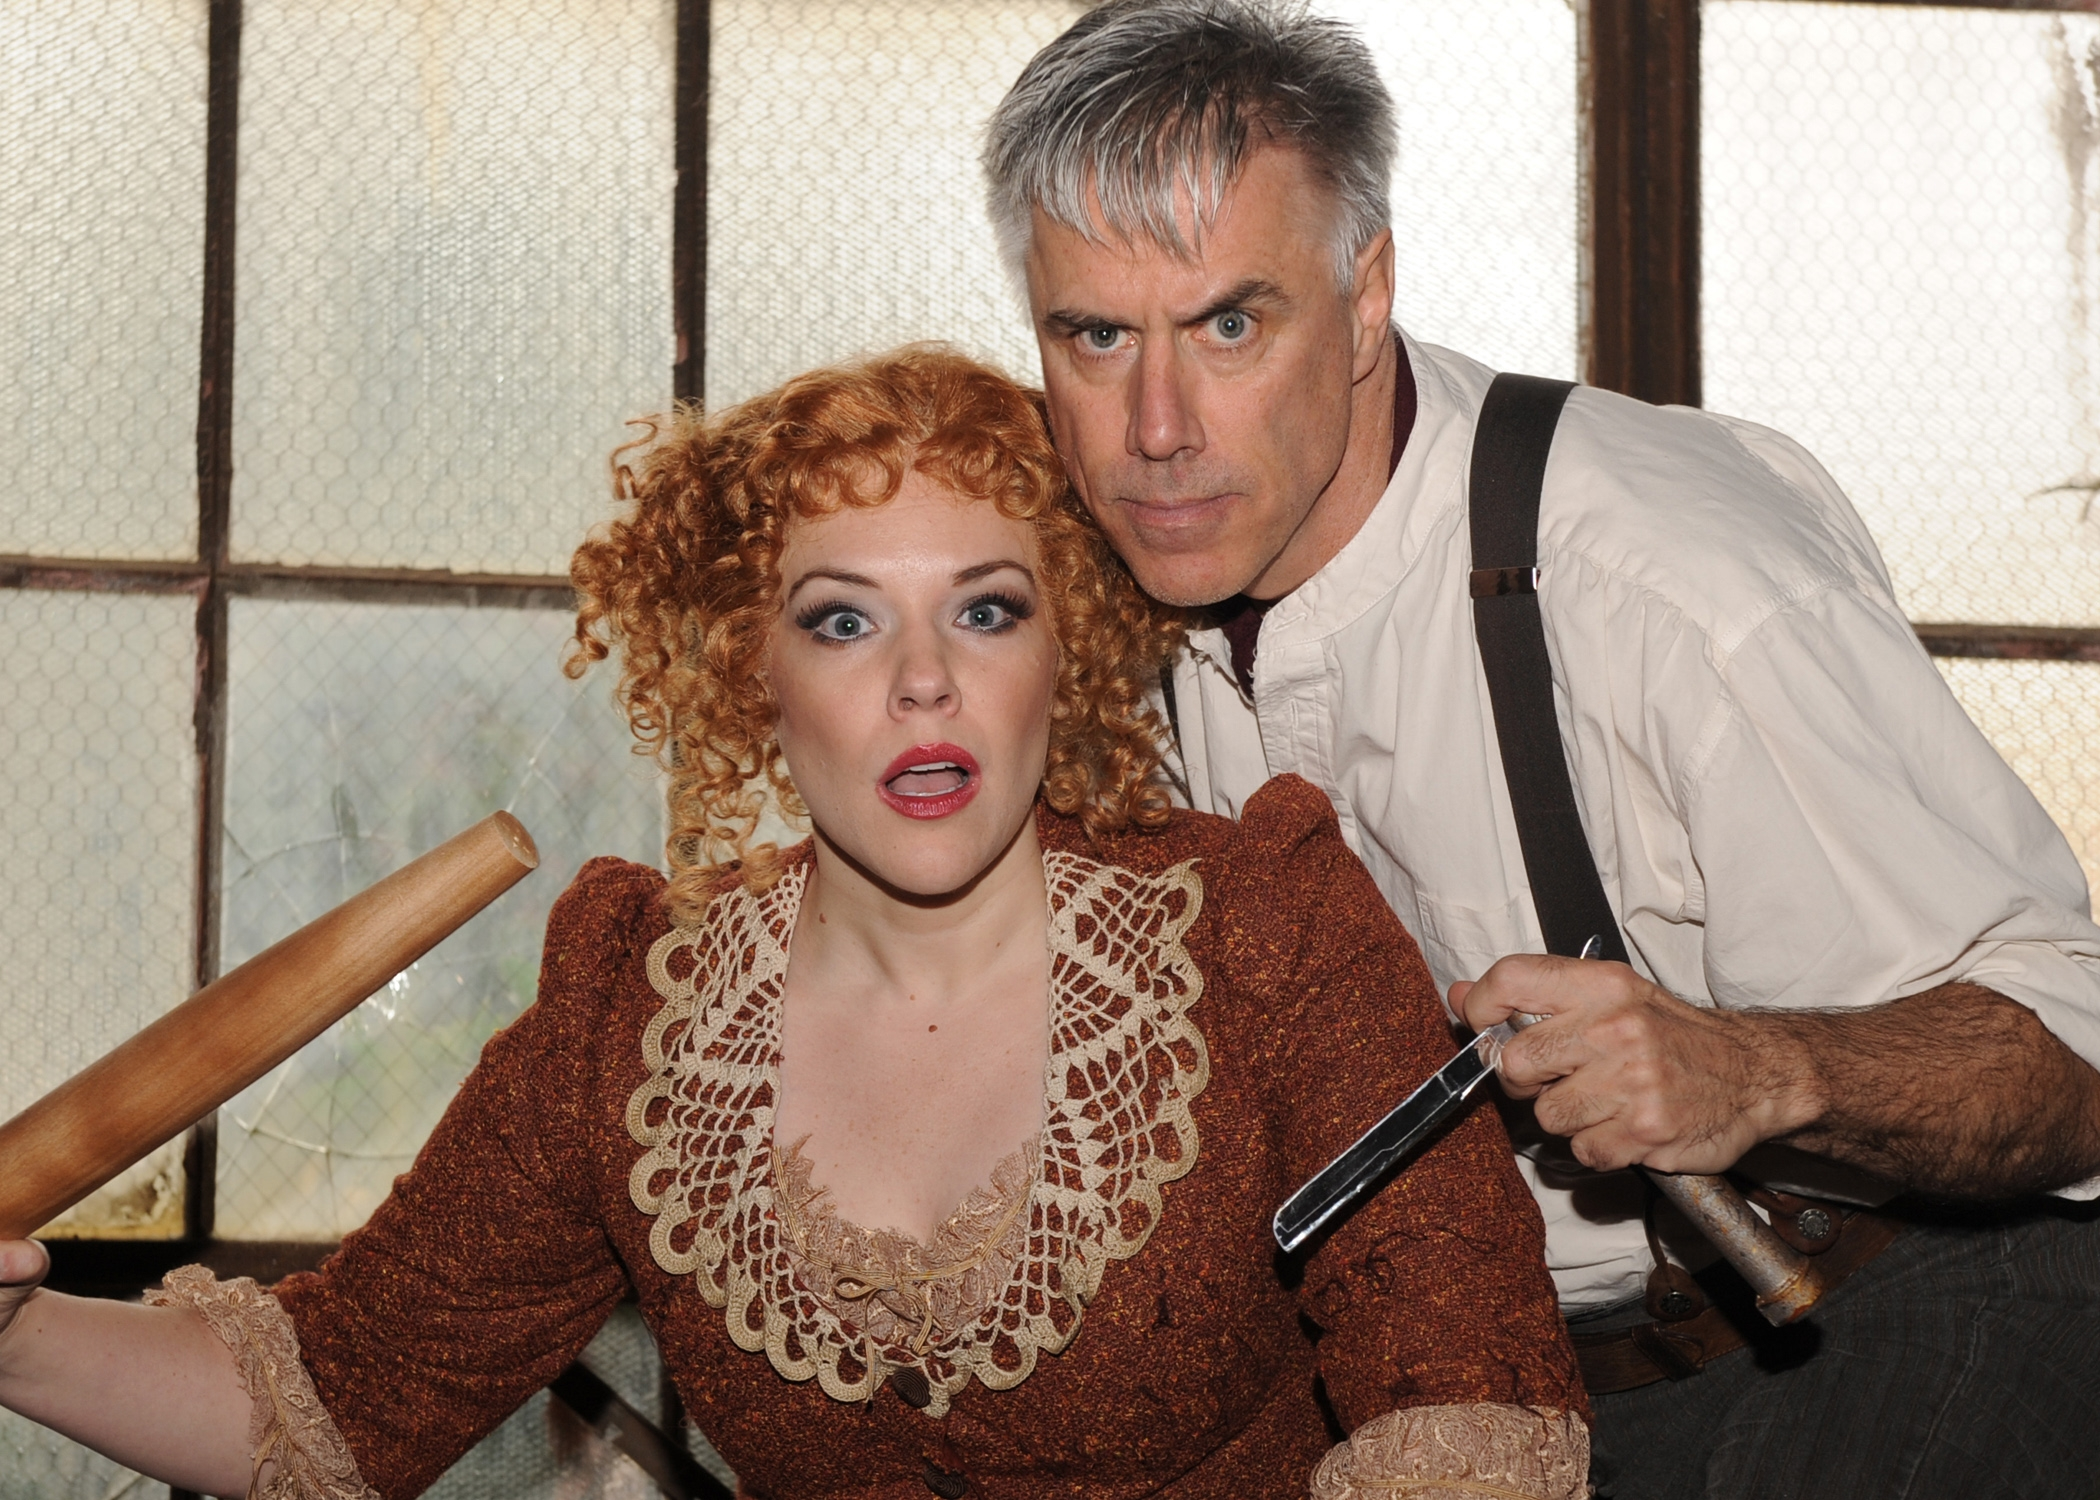 Jeff McCarthy & Emily Skinner Star In Lyric Theater's SWEENEY TODD, Opens 10/22